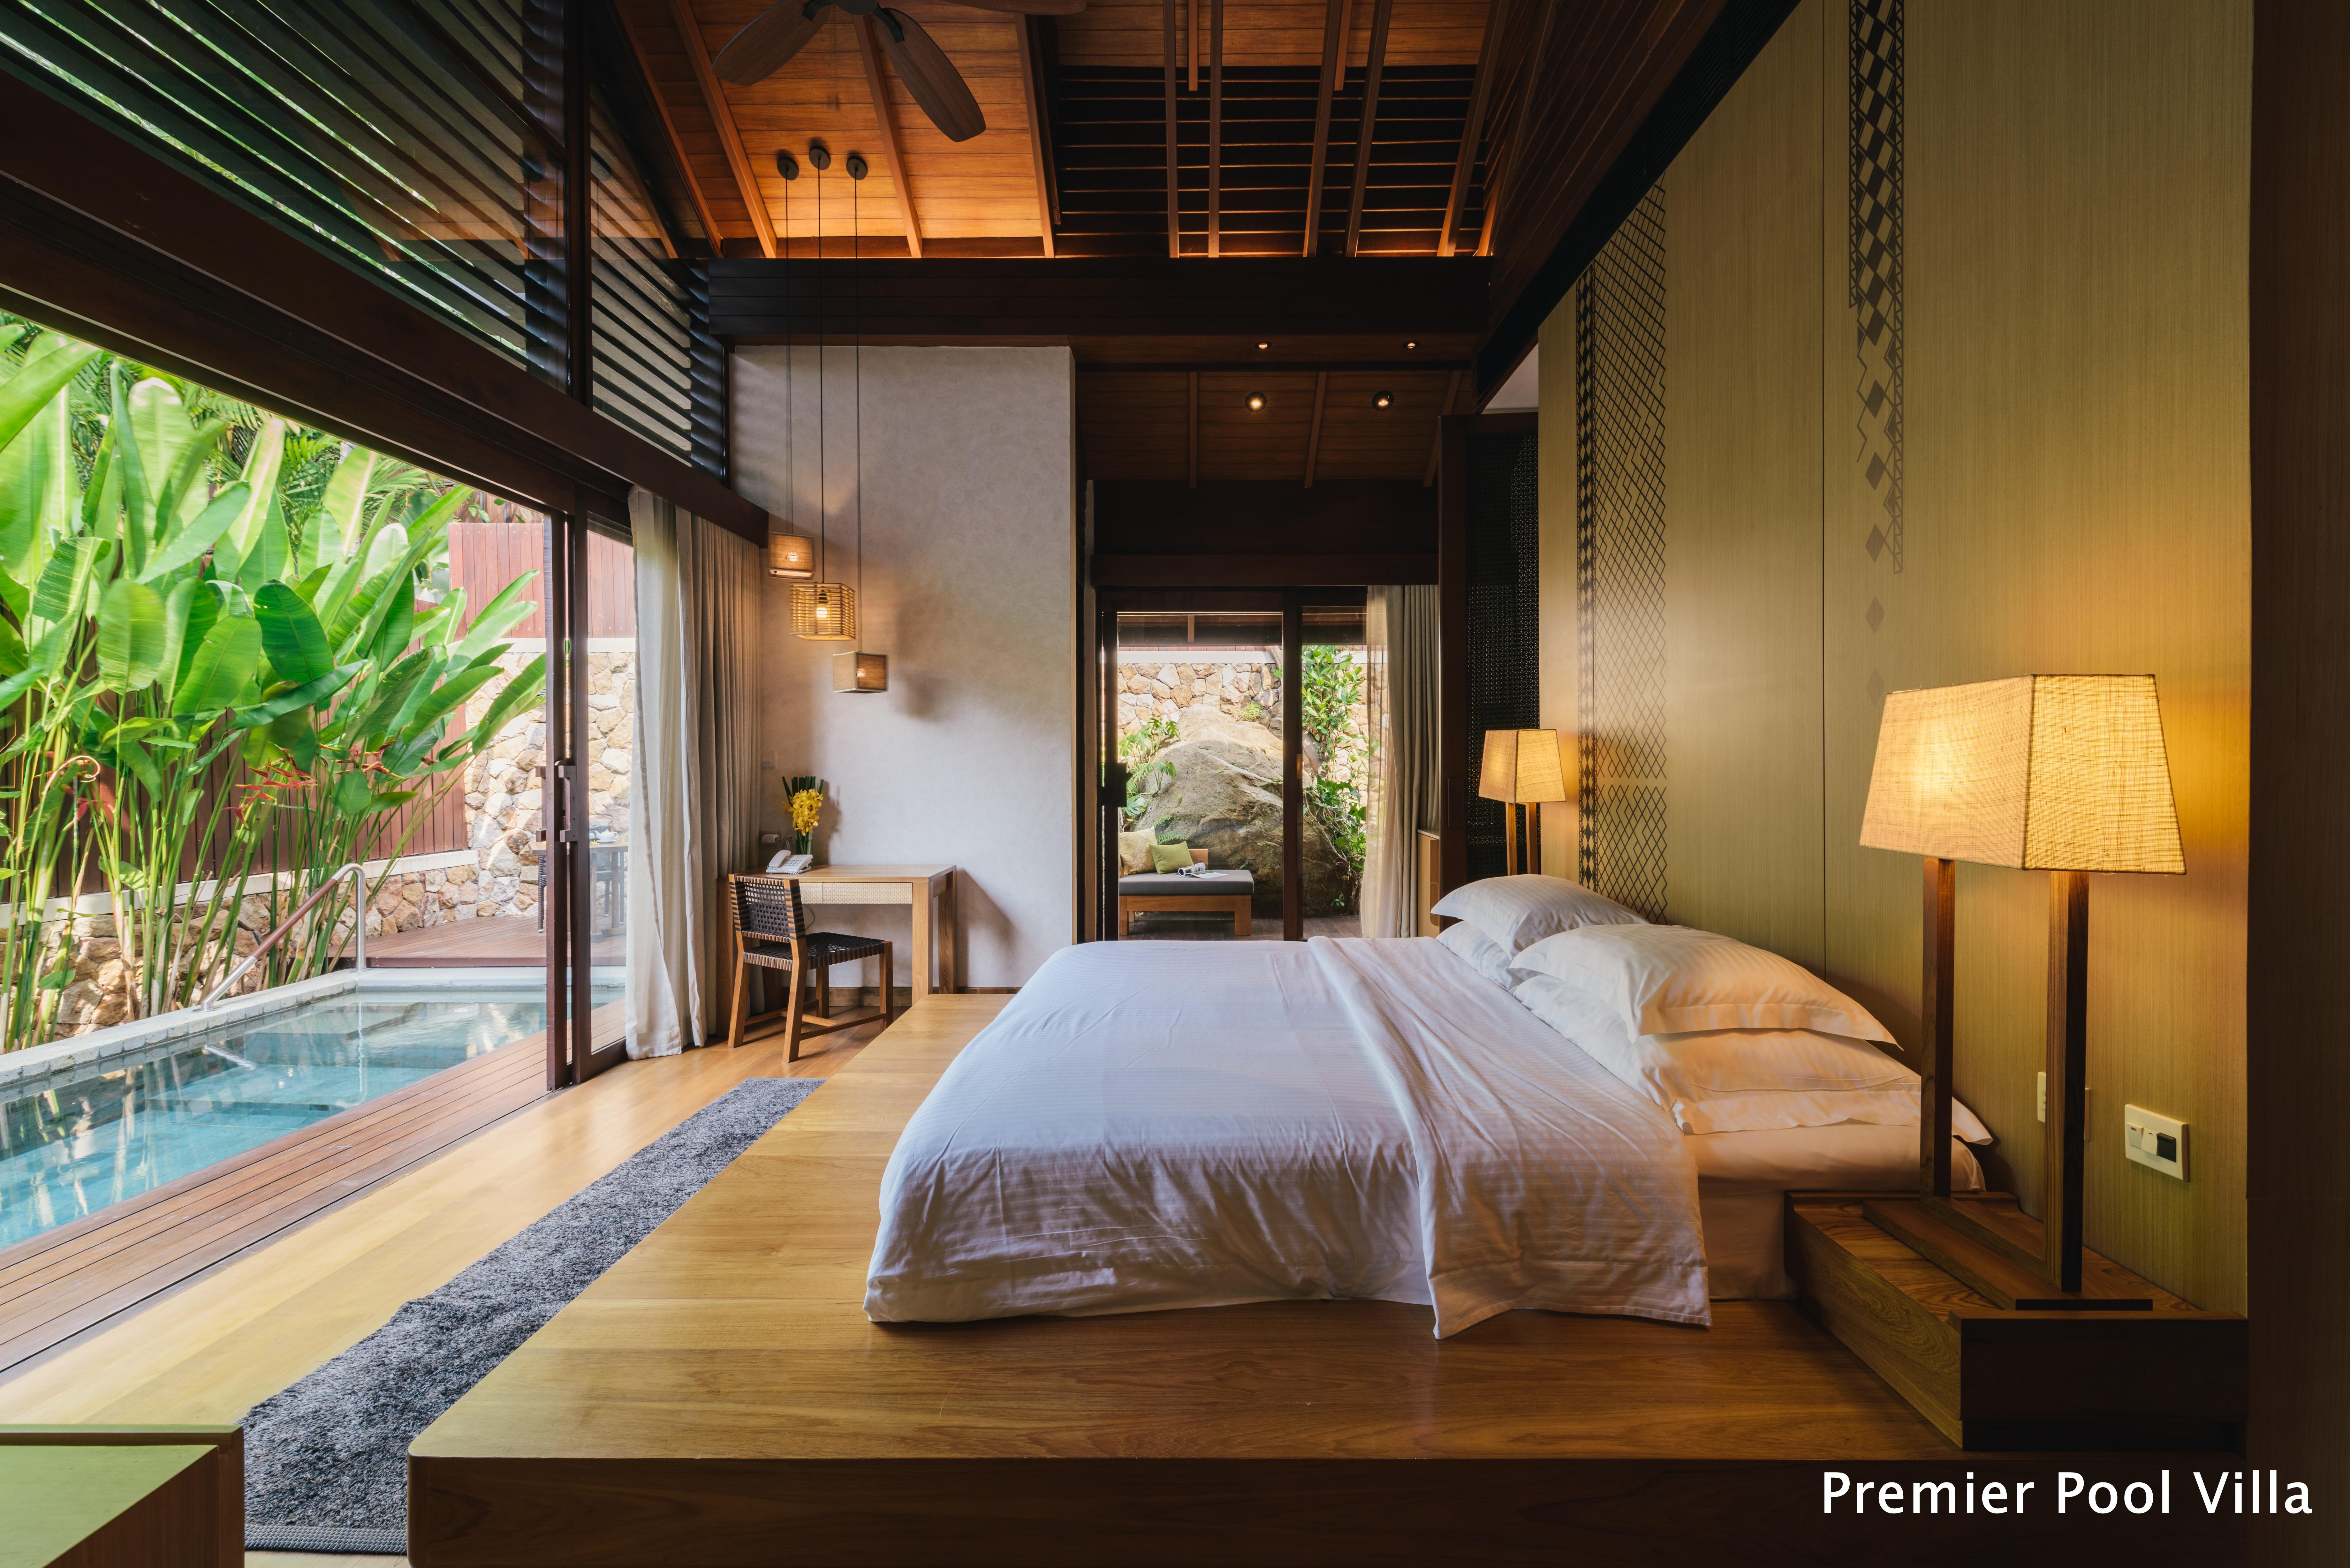 Premier Pool Villa Bedroom 01